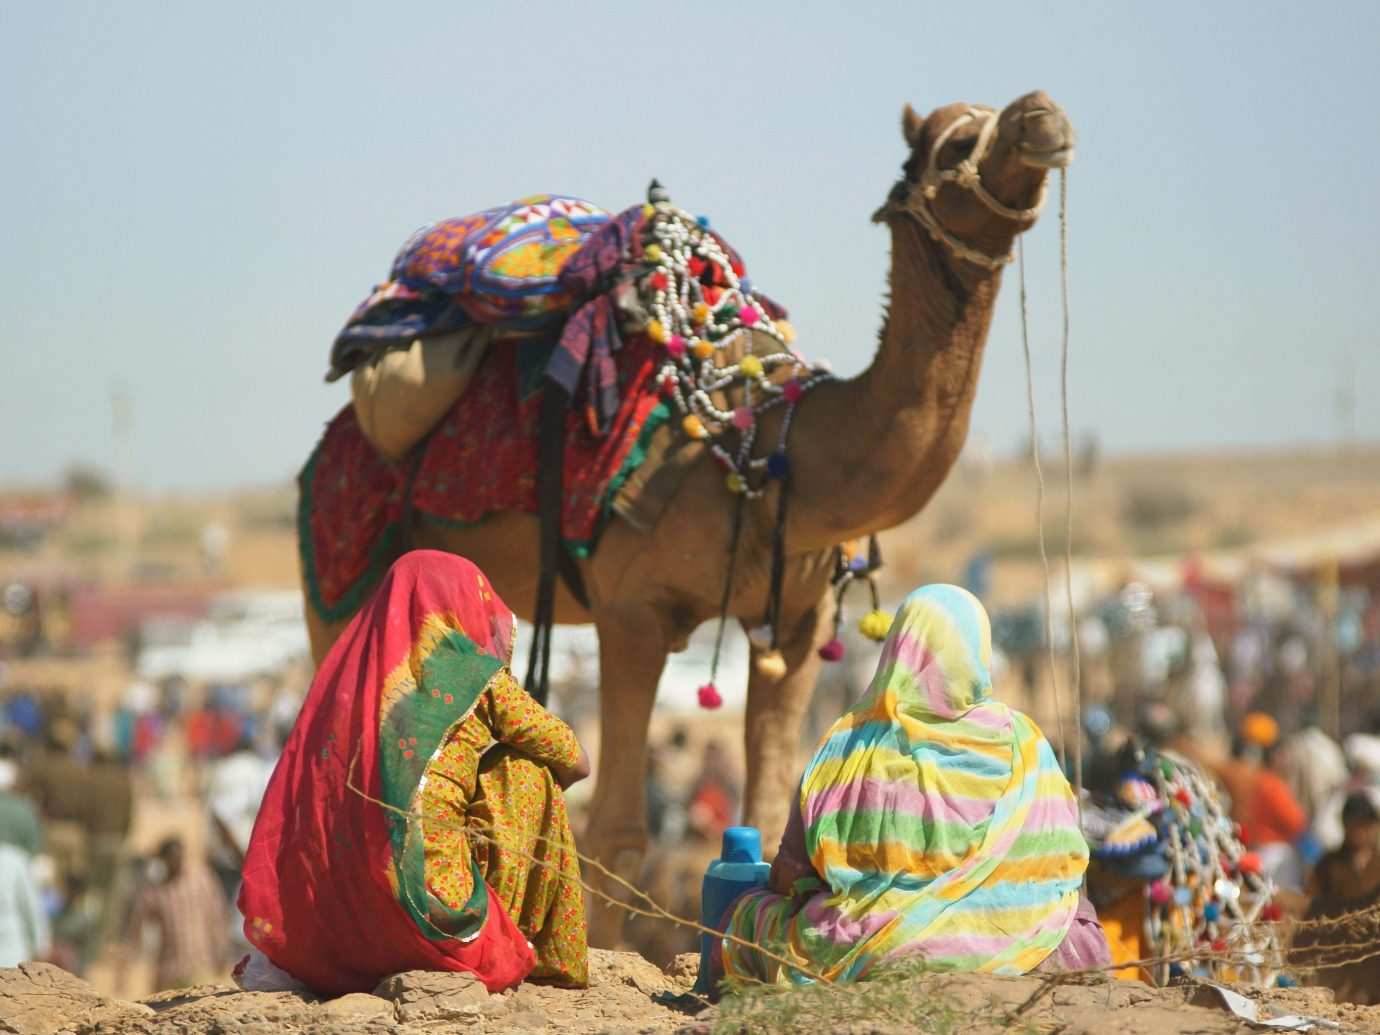 Trip Ideas sky Camel outdoor mammal camel like mammal arabian camel Sport colorful dancer